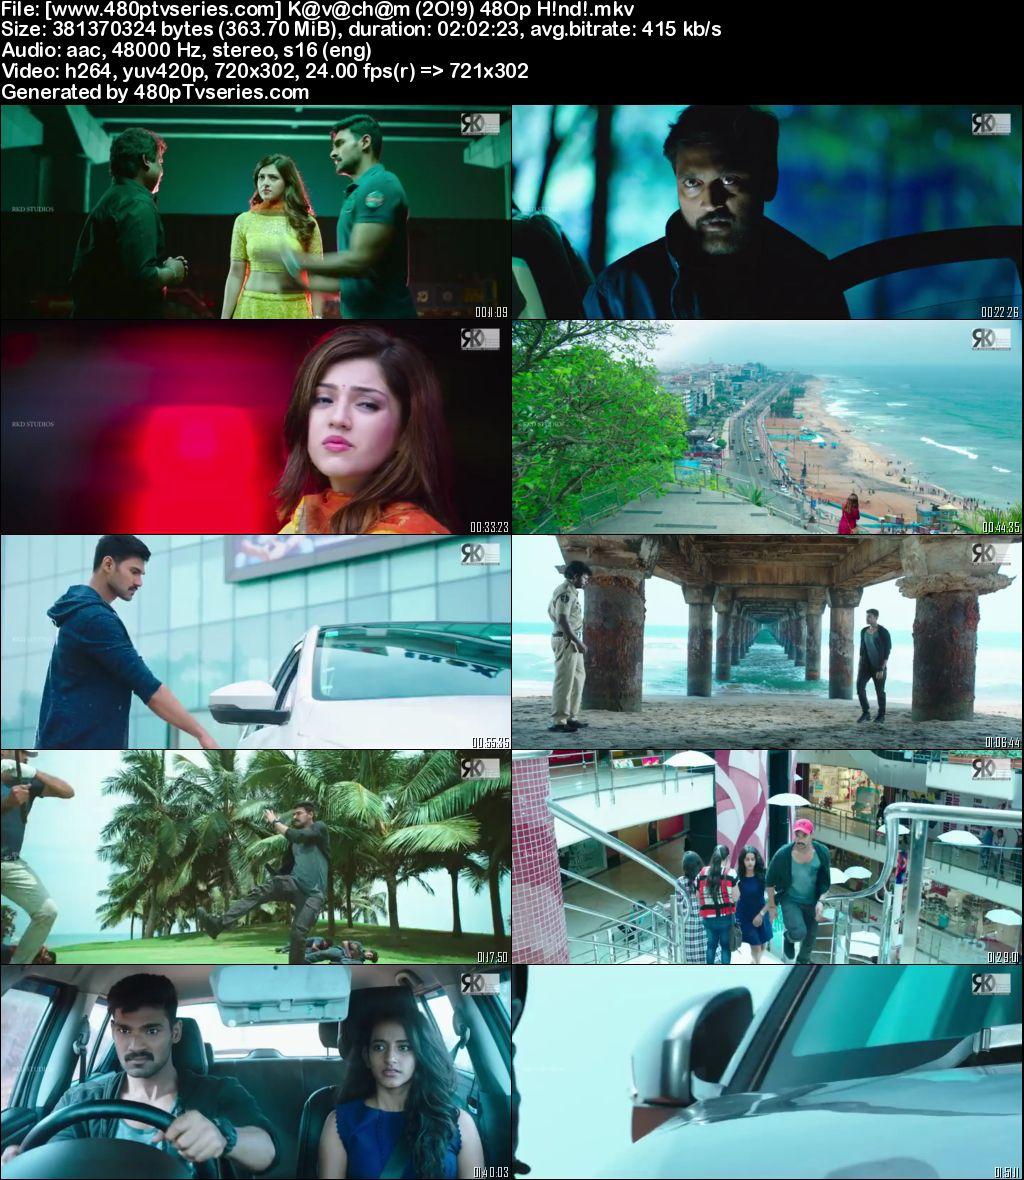 Inspector Vijay (Kavacham) (2019) 350MB Full Hindi Dubbed Movie Download 480p HDRip Free Watch Online Full Movie Download Worldfree4u 9xmovies